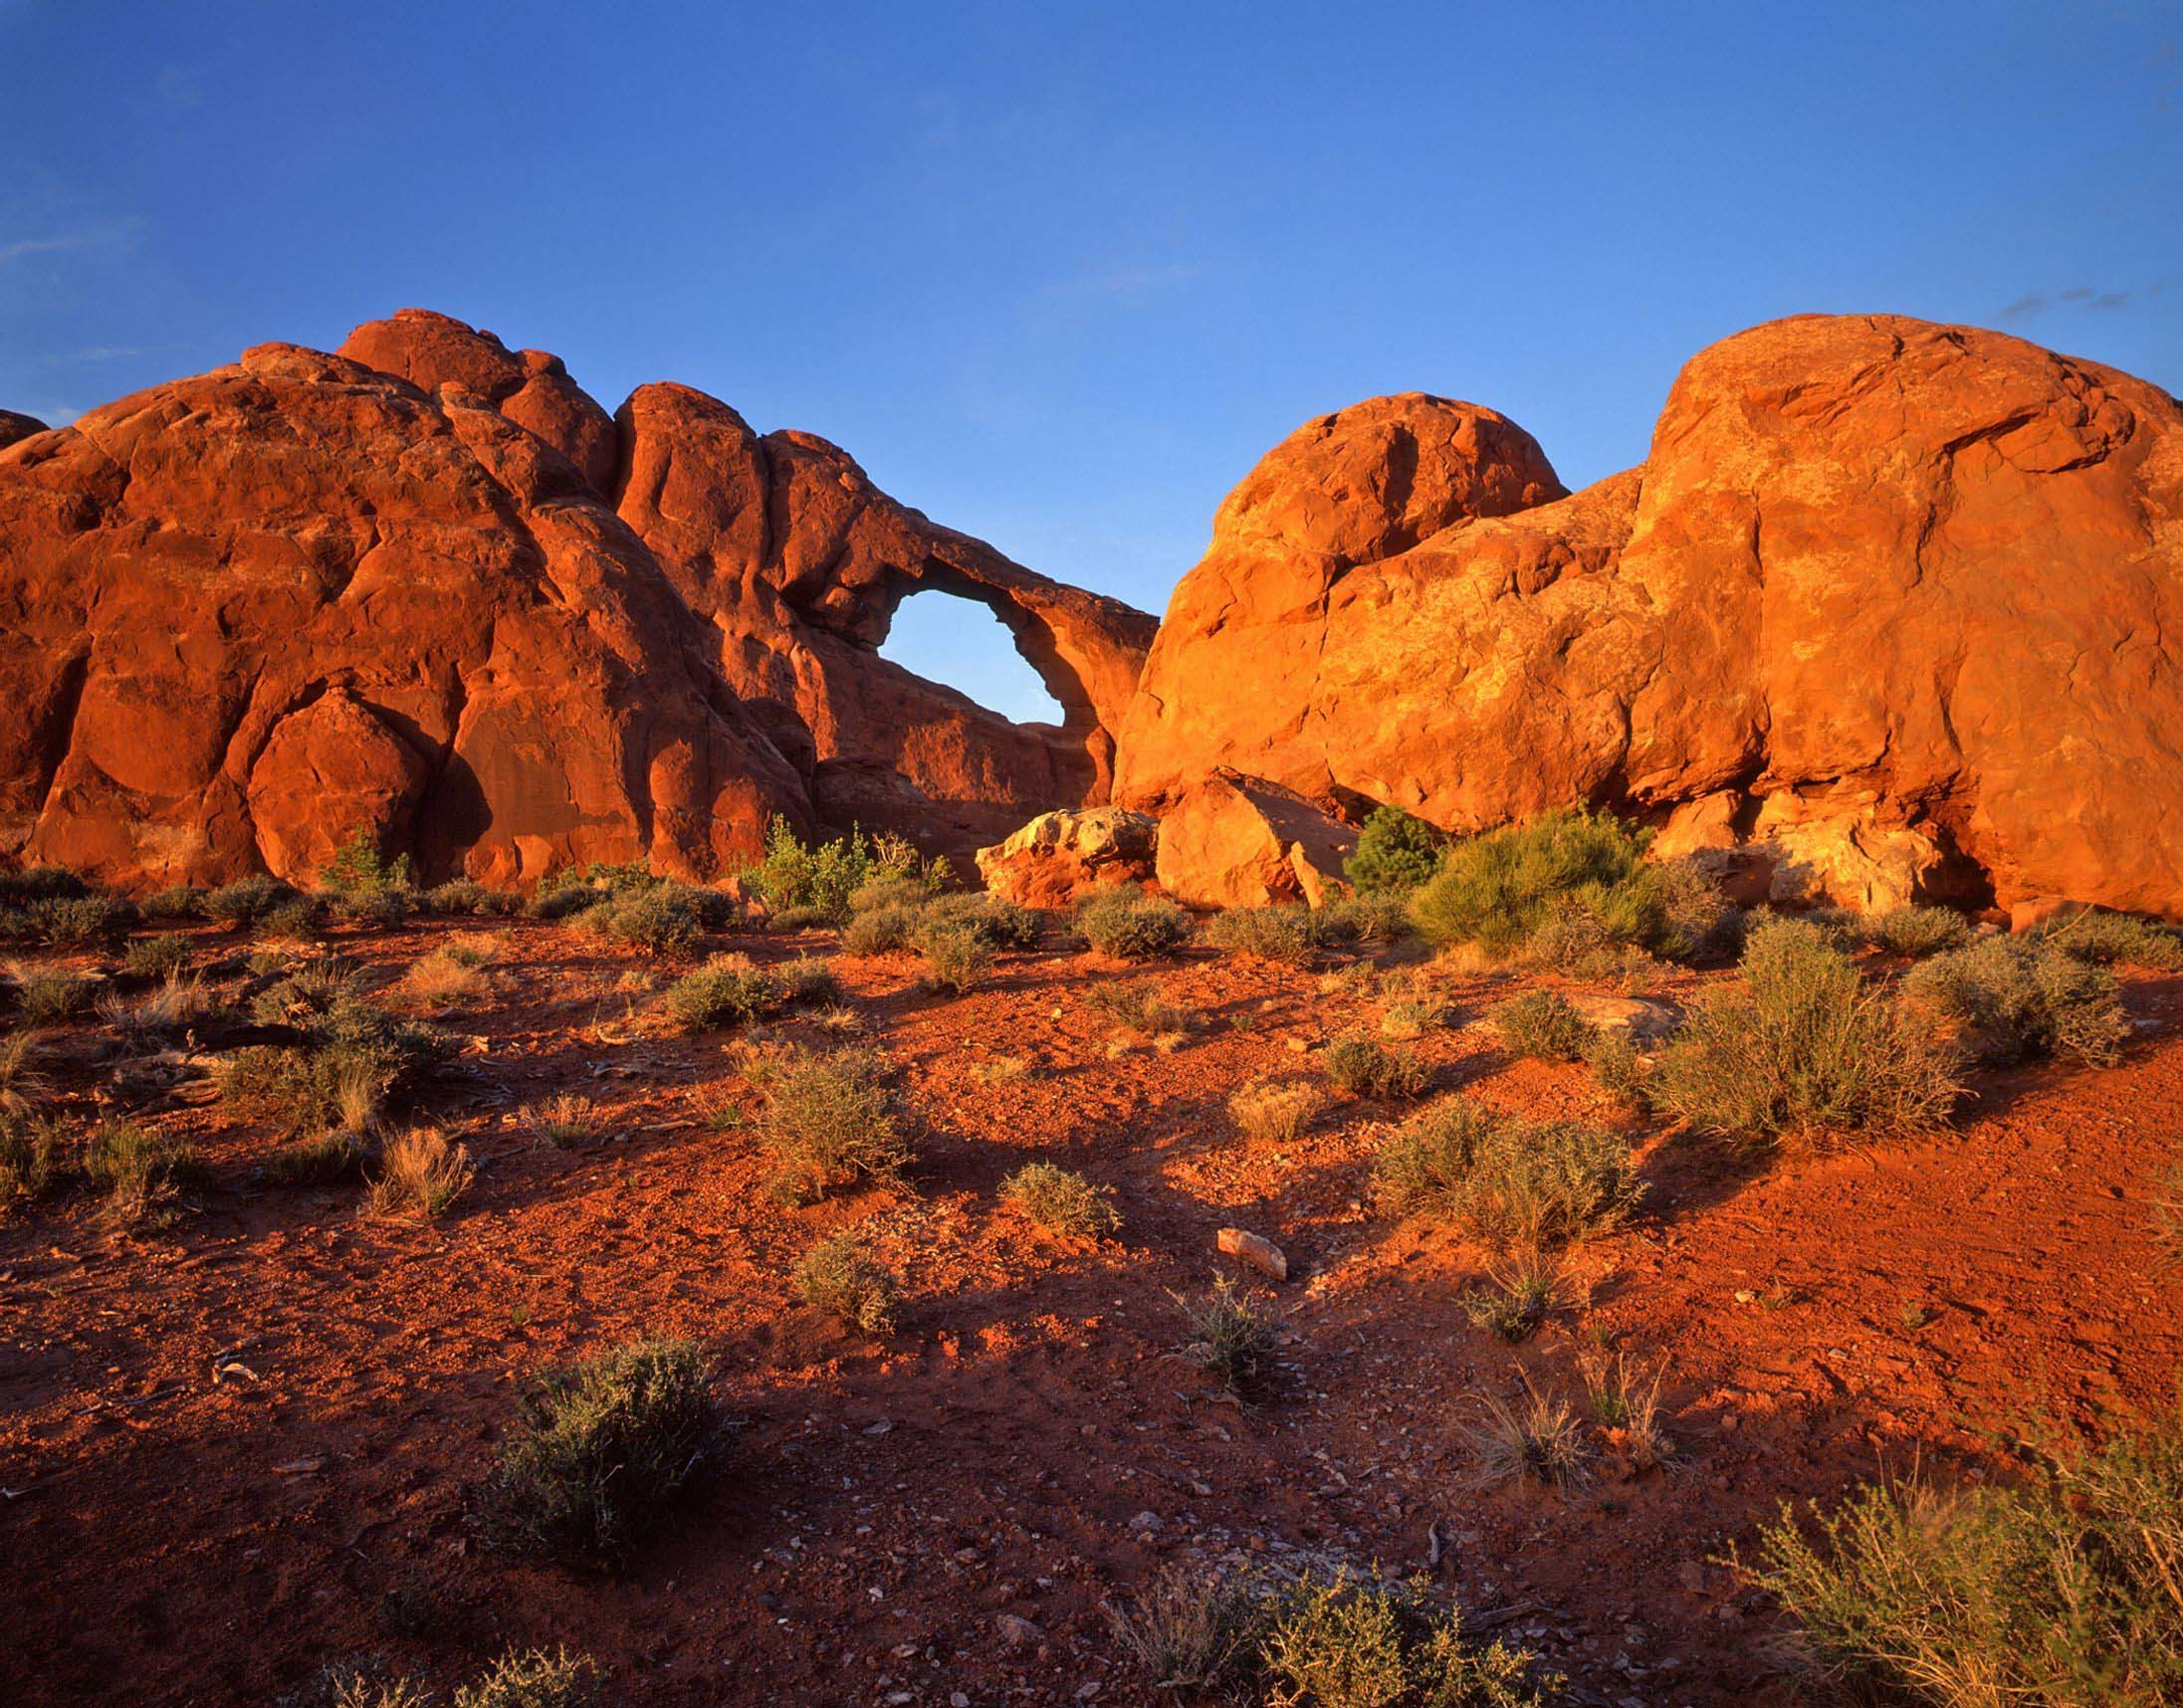 redrock-landscape-utah-usa